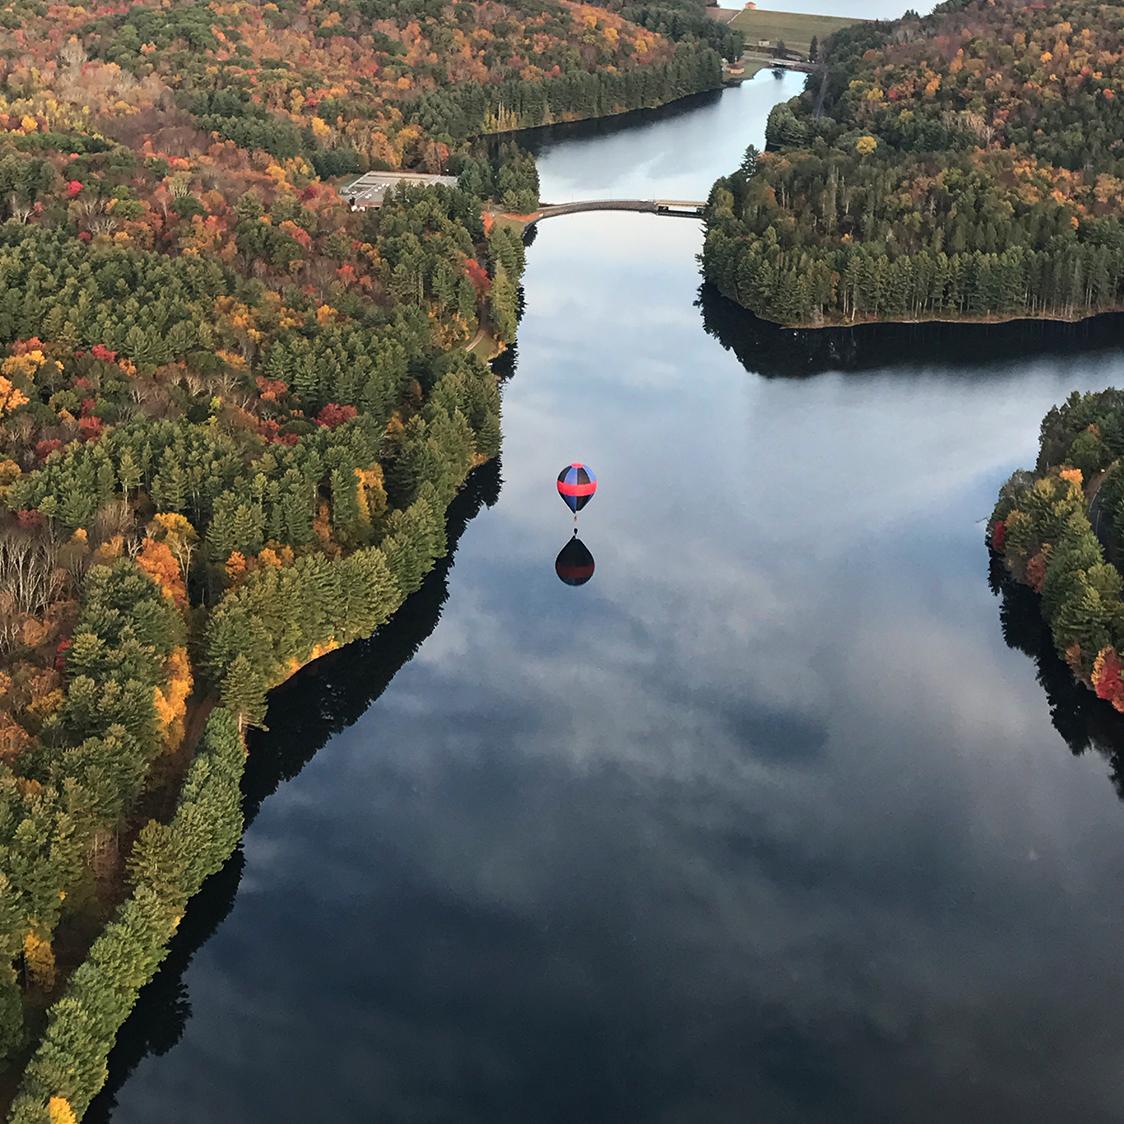 hot_air_balloon_fall_flight_lake.jpg